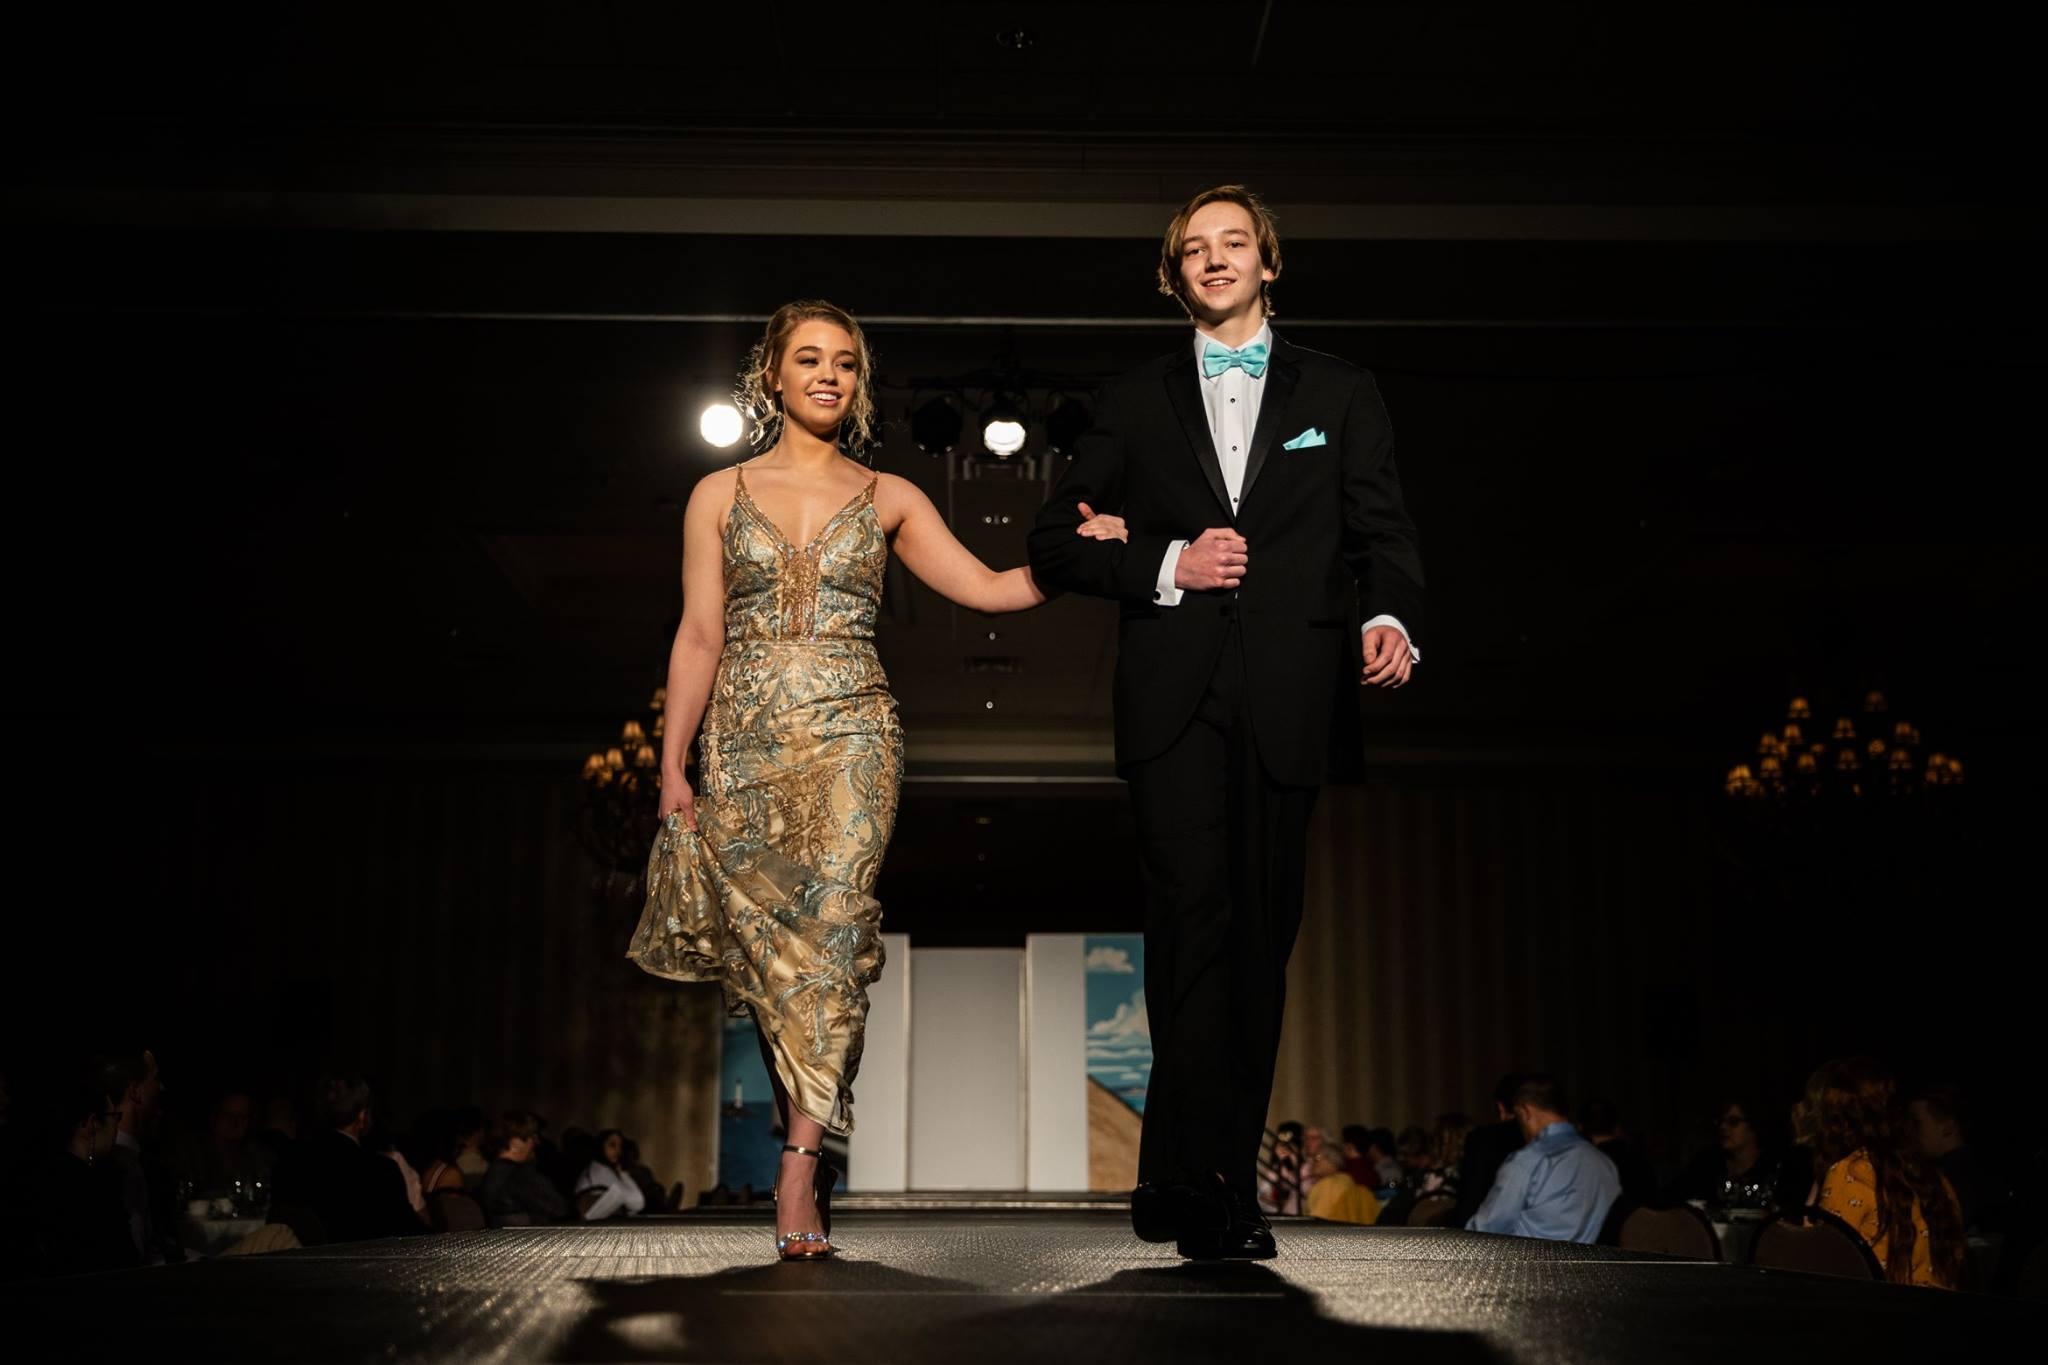 Lutheran_North_High_School_Macomb_Michigan_LHN_Fashion_Show_2019_Seniors (60).jpg